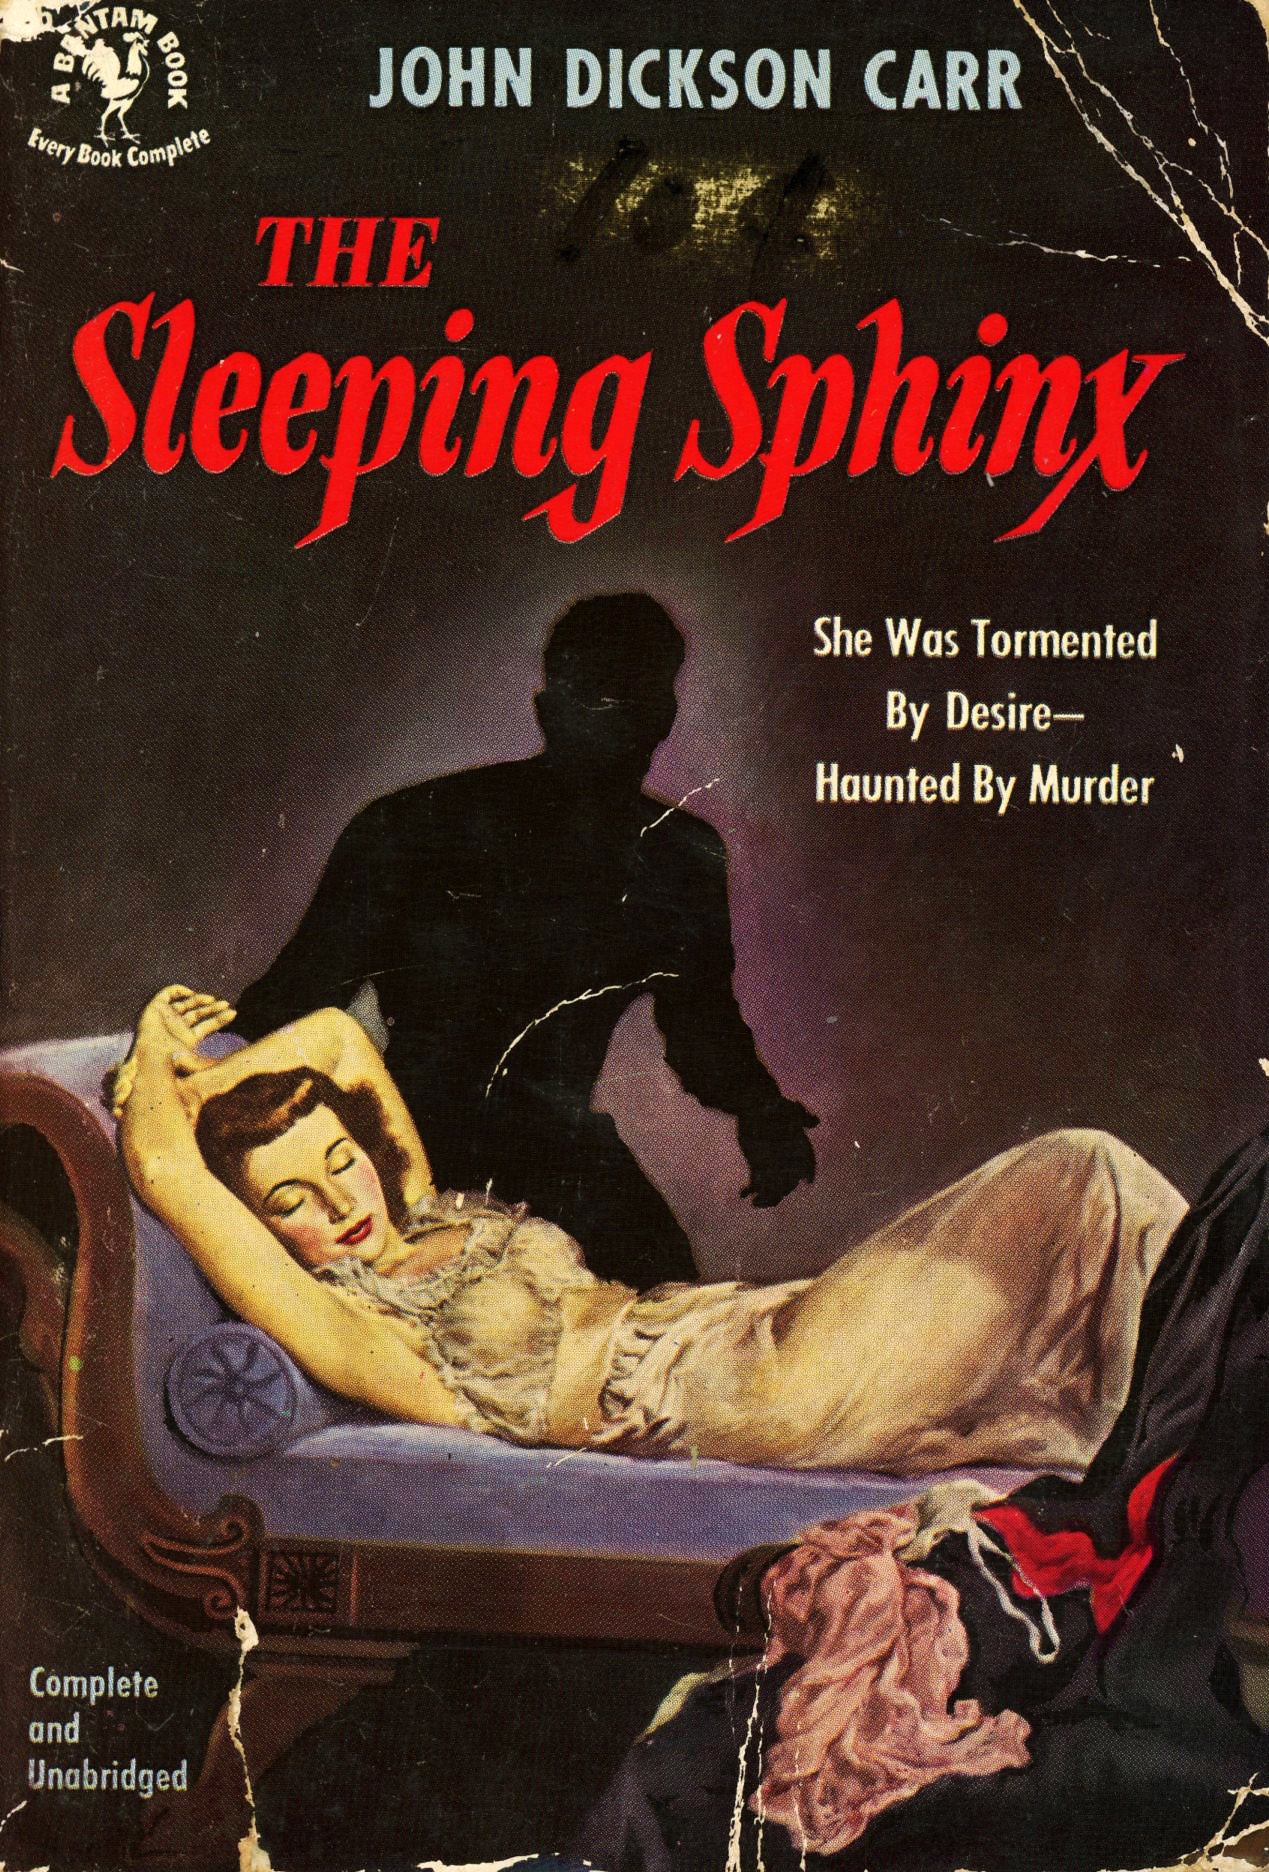 Джон Диксон Карр — Спящий сфинкс (1947)